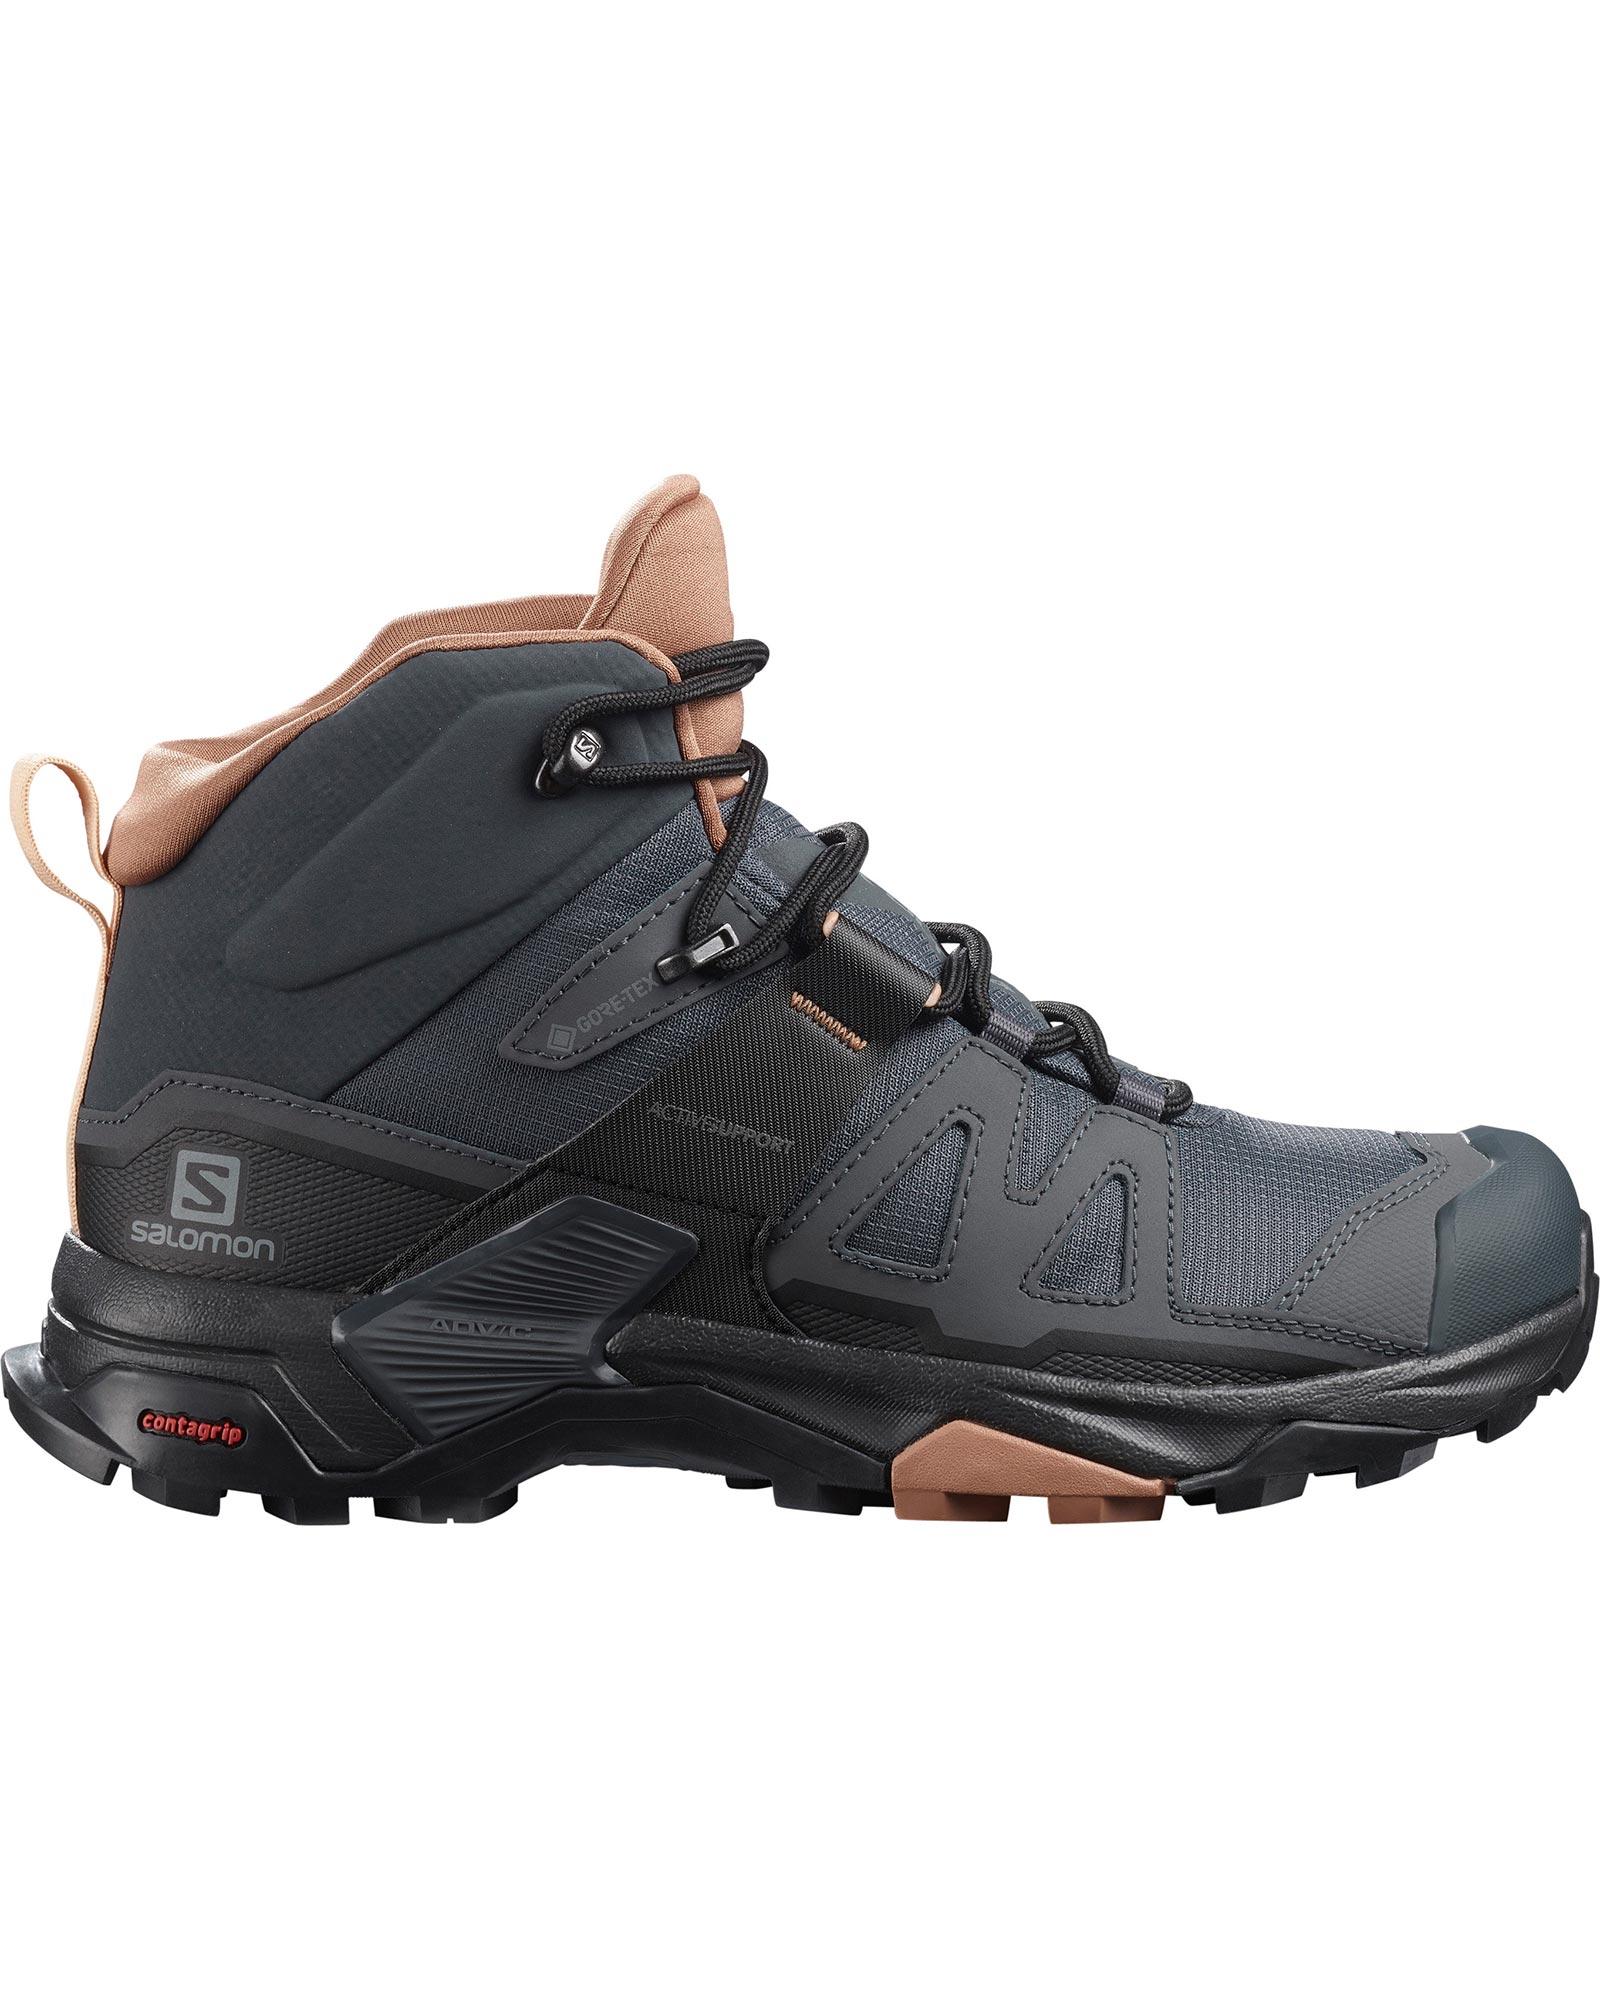 Salomon X Ultra 4 Mid GORE-TEX Women's Boots 0